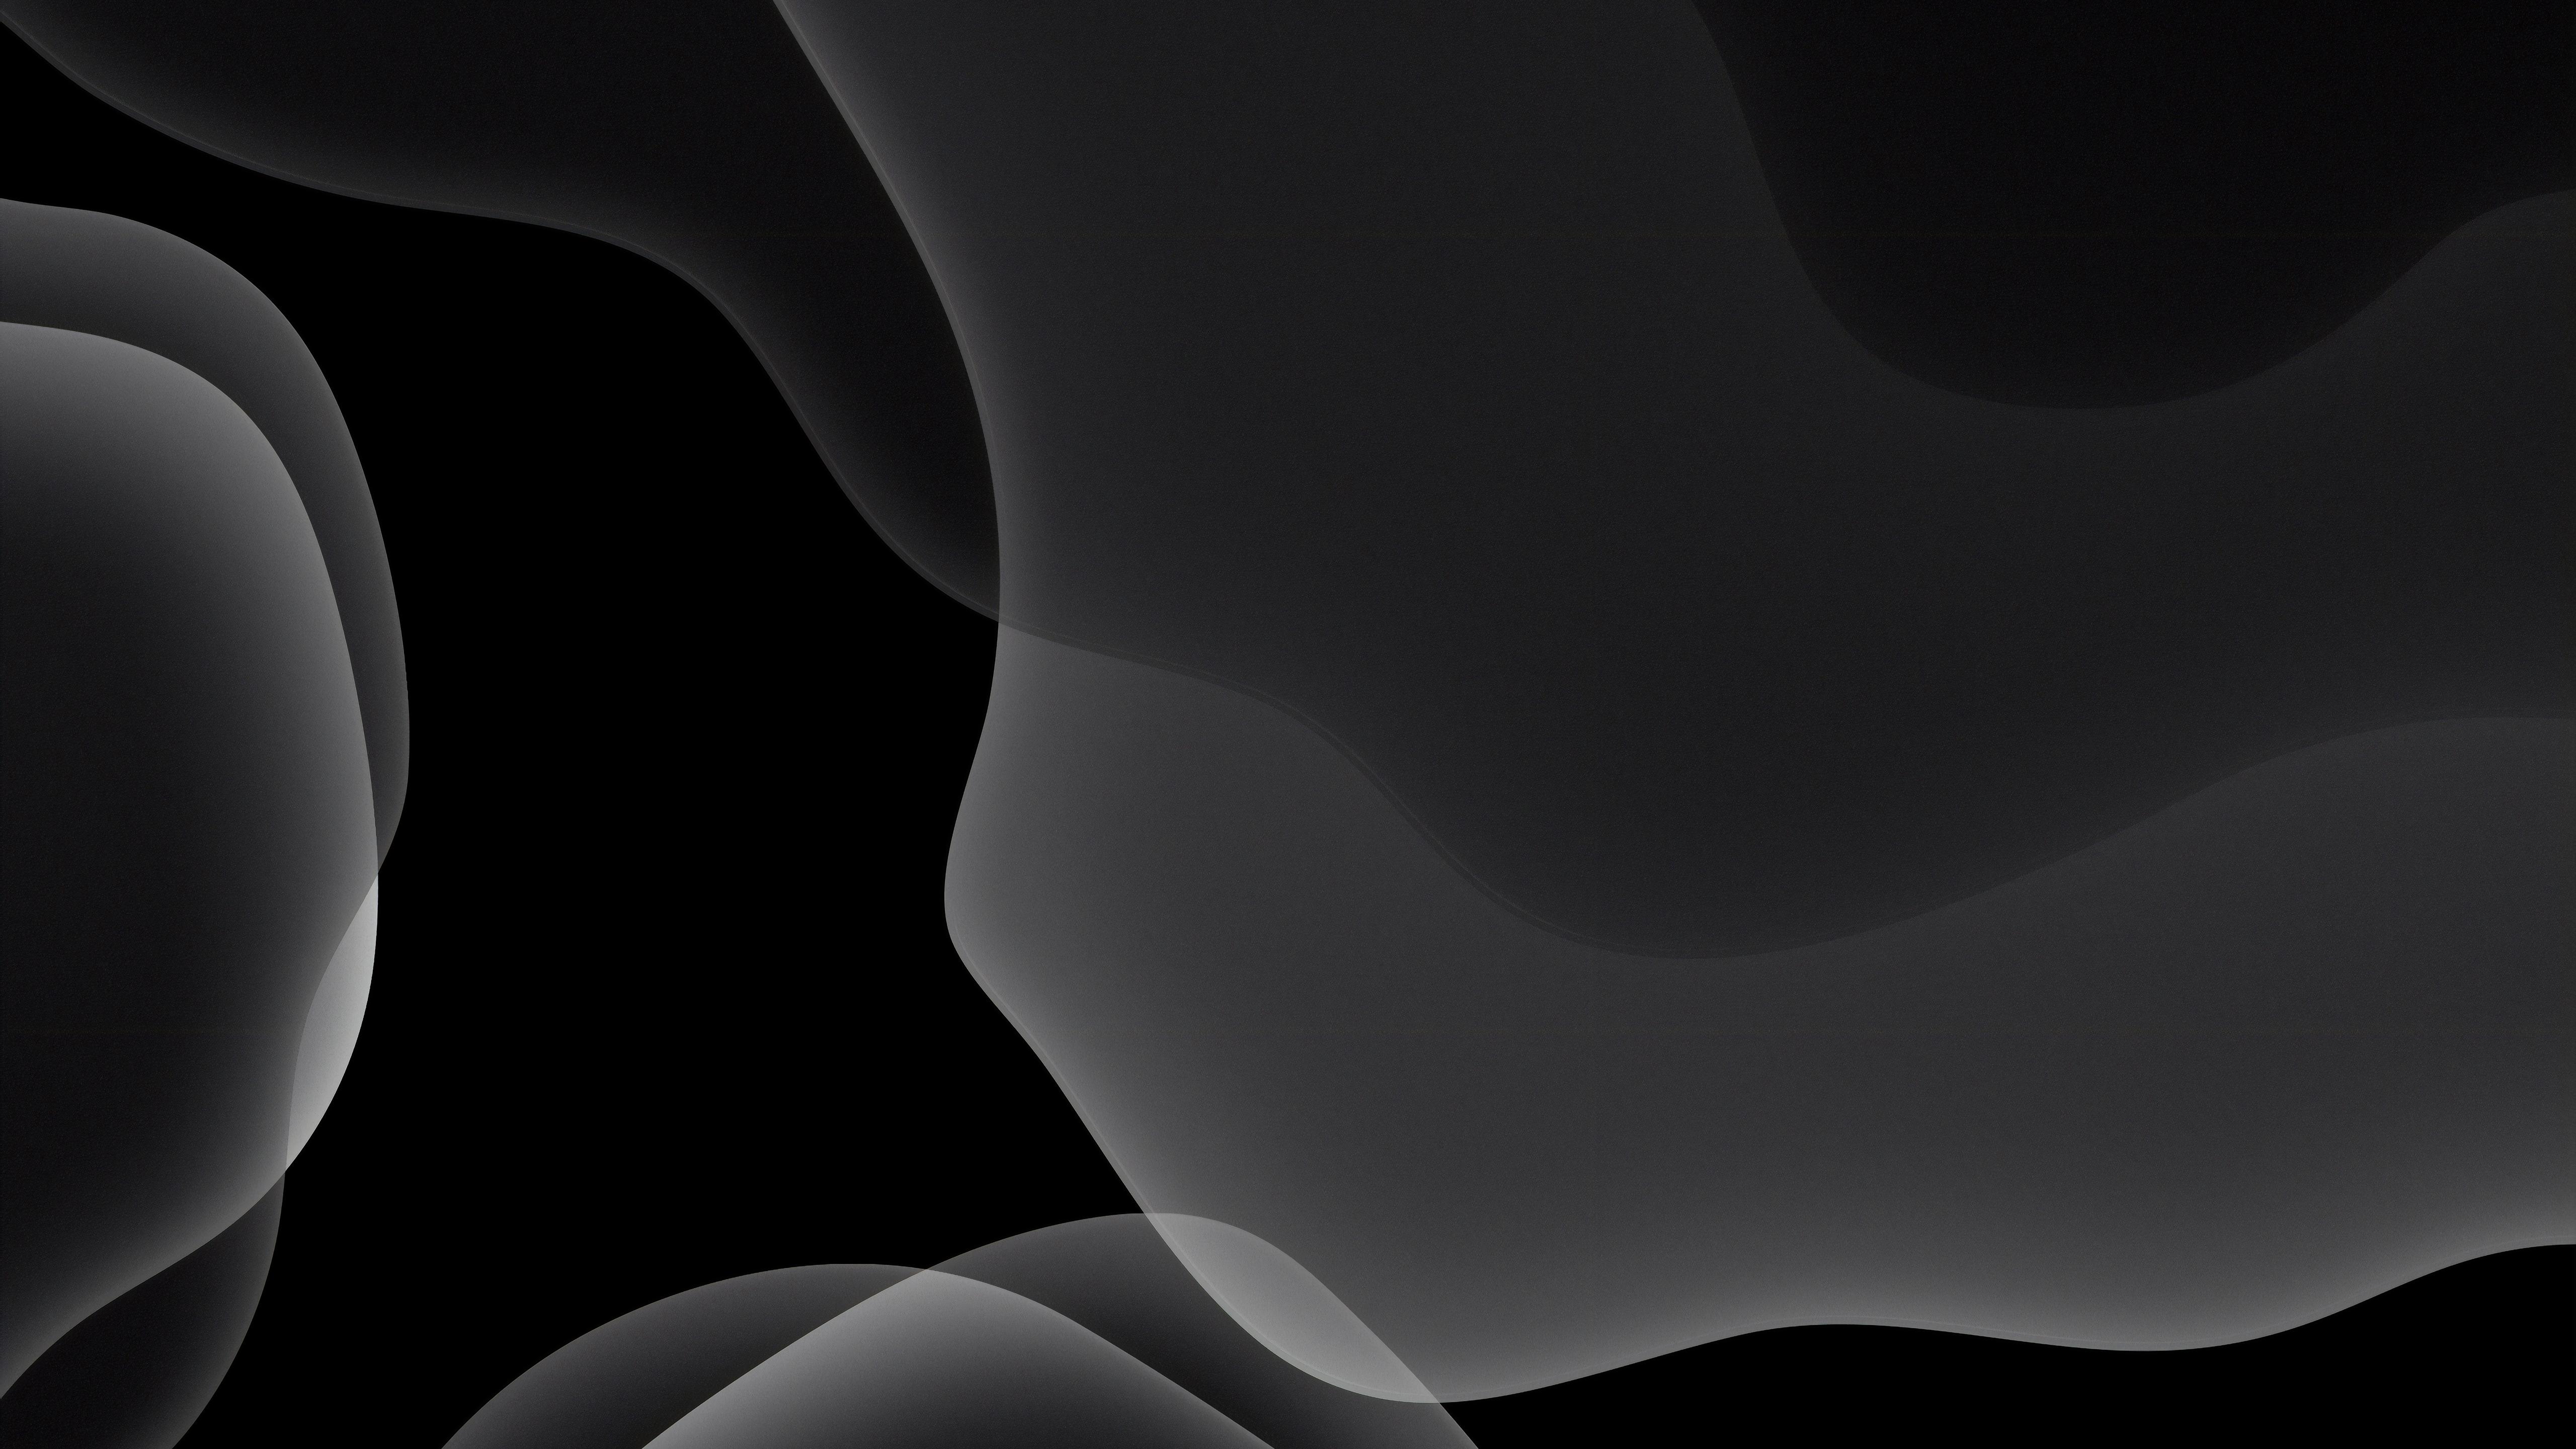 2932x2932 Ios 13 Grey Dark 5k Ipad Pro Retina Display Hd 4k